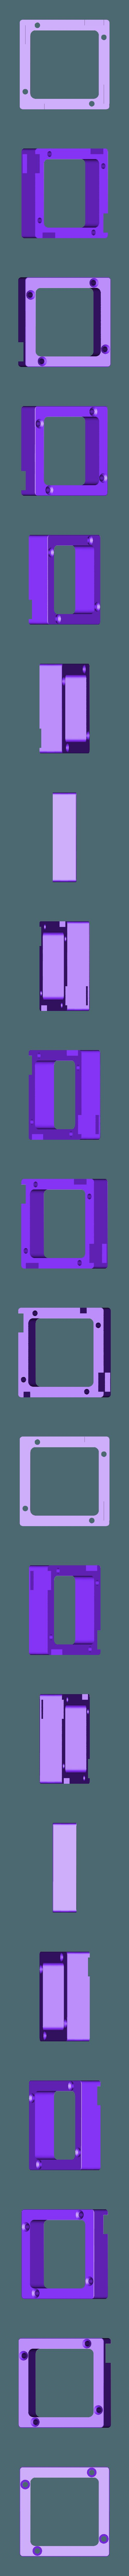 LidBottom.stl Download STL file Magnetic Escape Room Puzzle Box • Design to 3D print, Osprey